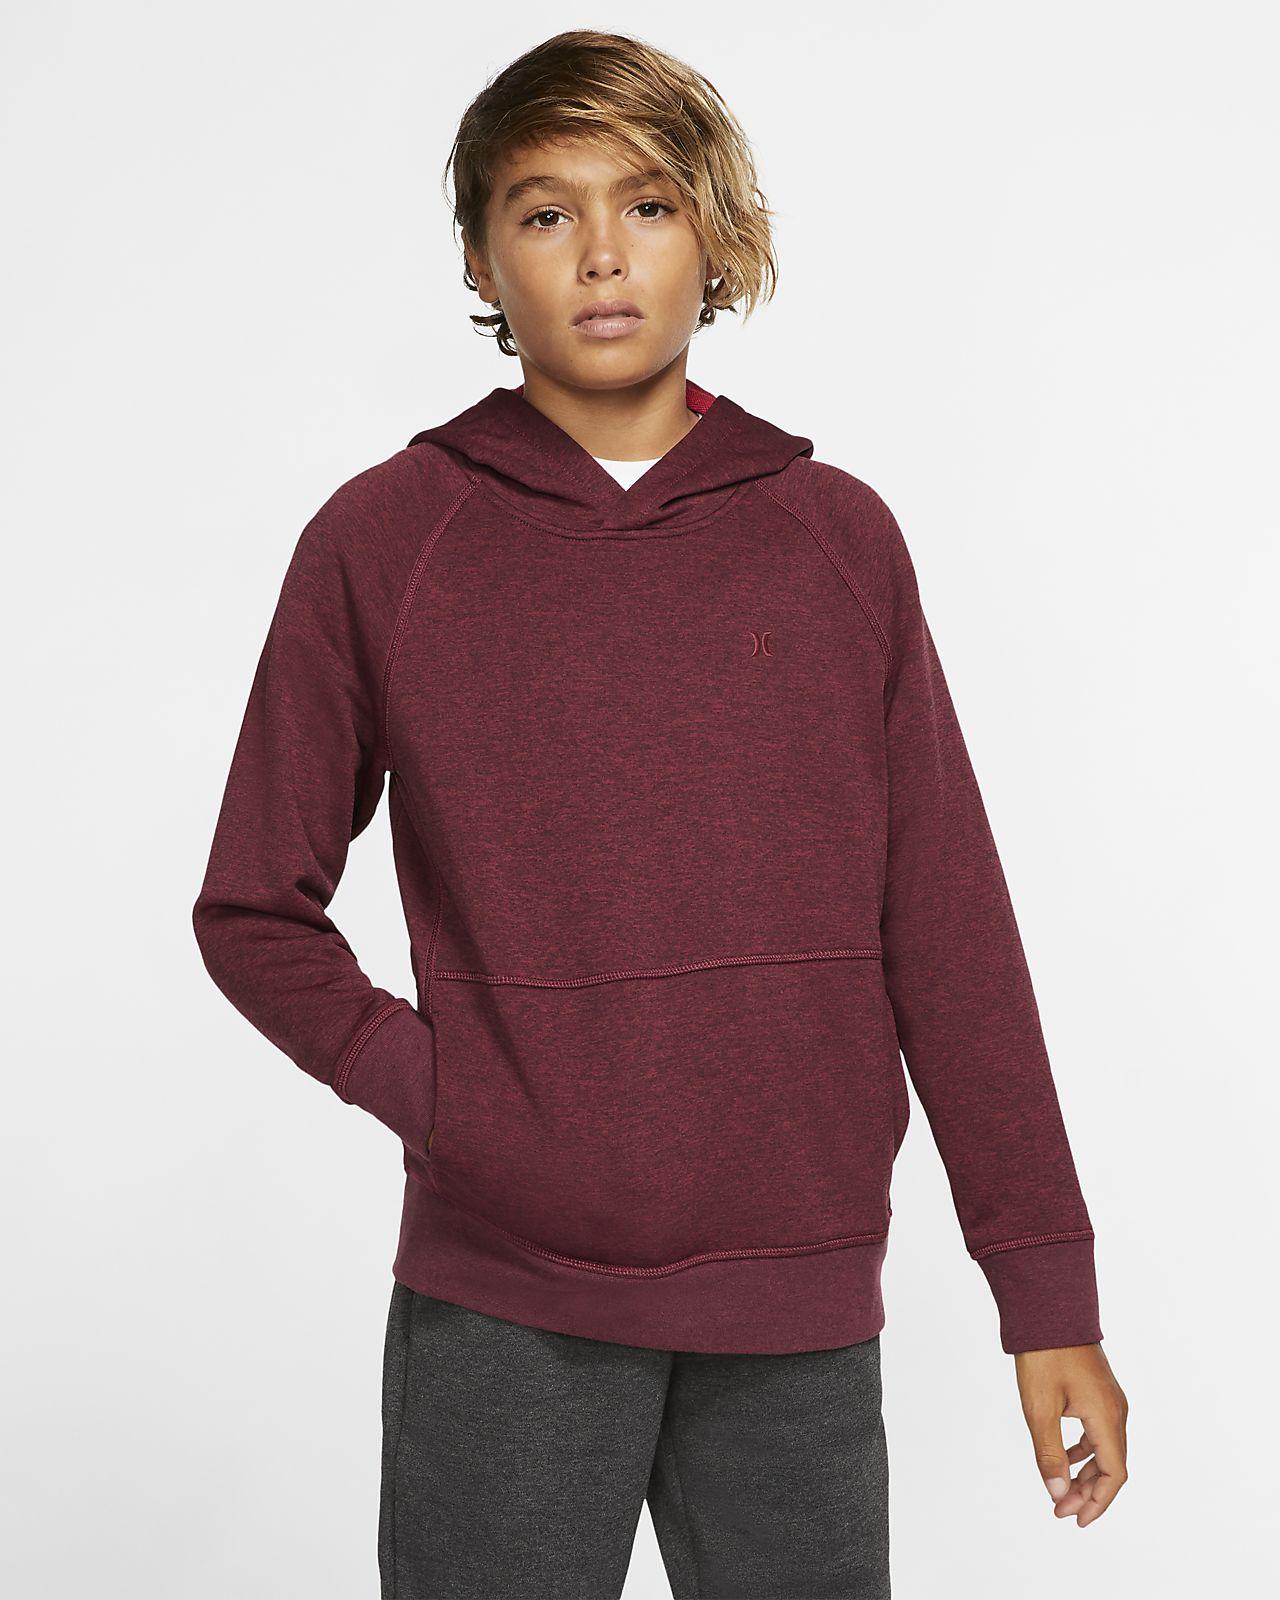 Hurley Dri-FIT Disperse Boys' Fleece Pullover Hoodie